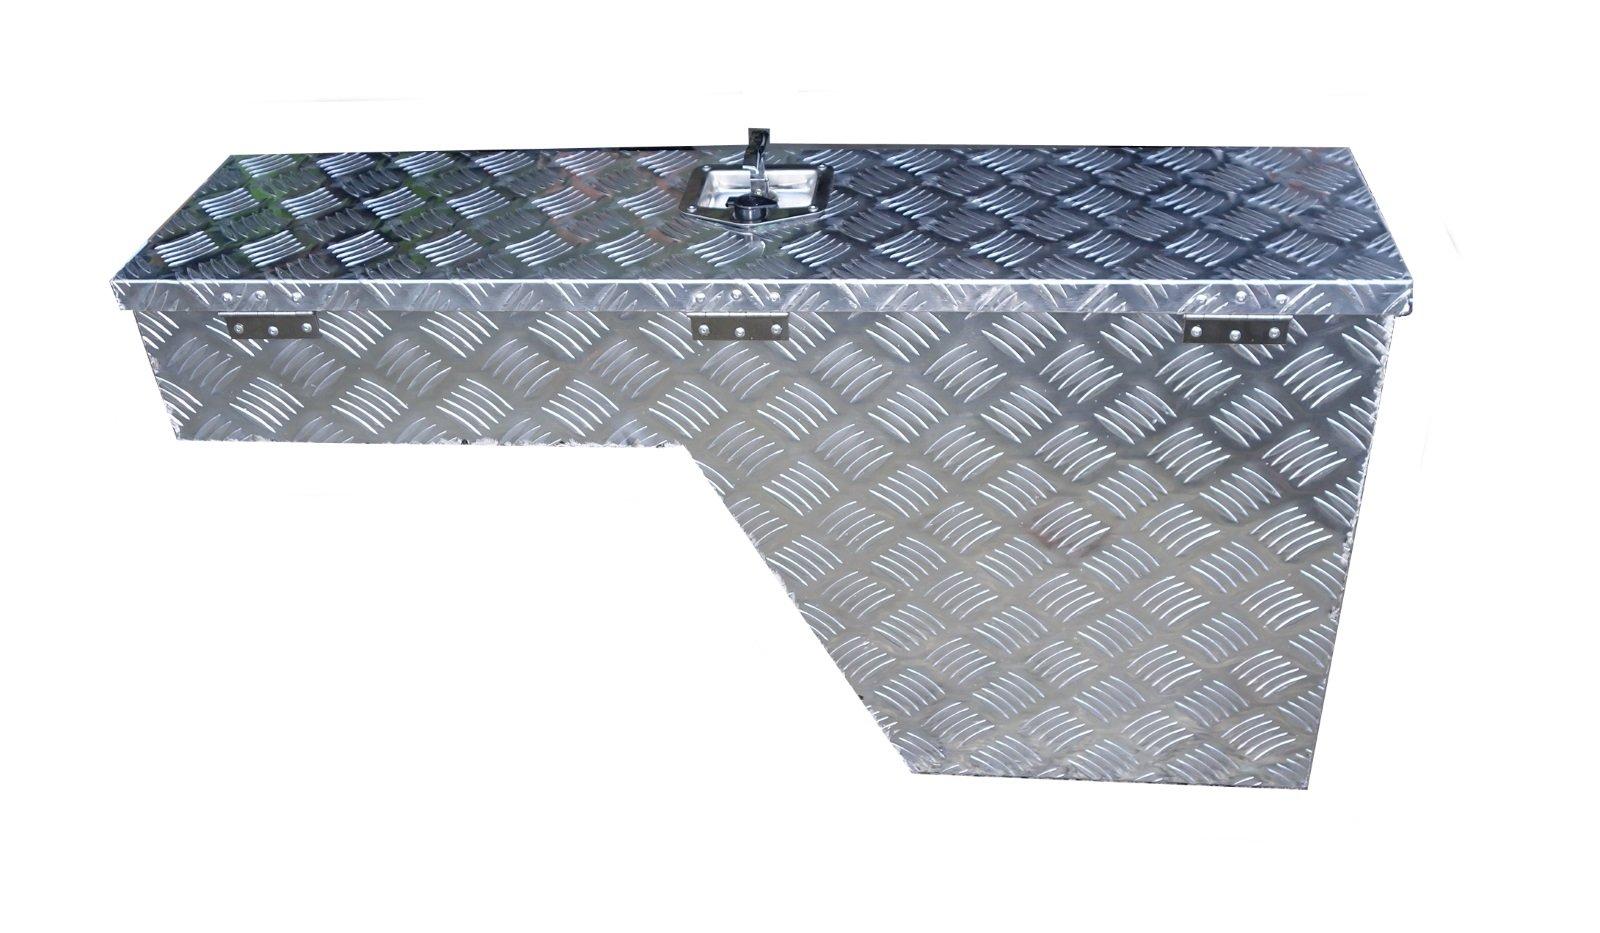 UWS EC30021 48-Inch Passenger-Side Heavy-Wall Aluminum Truck Fender Wheel Well Tool Box RigidCore Lid